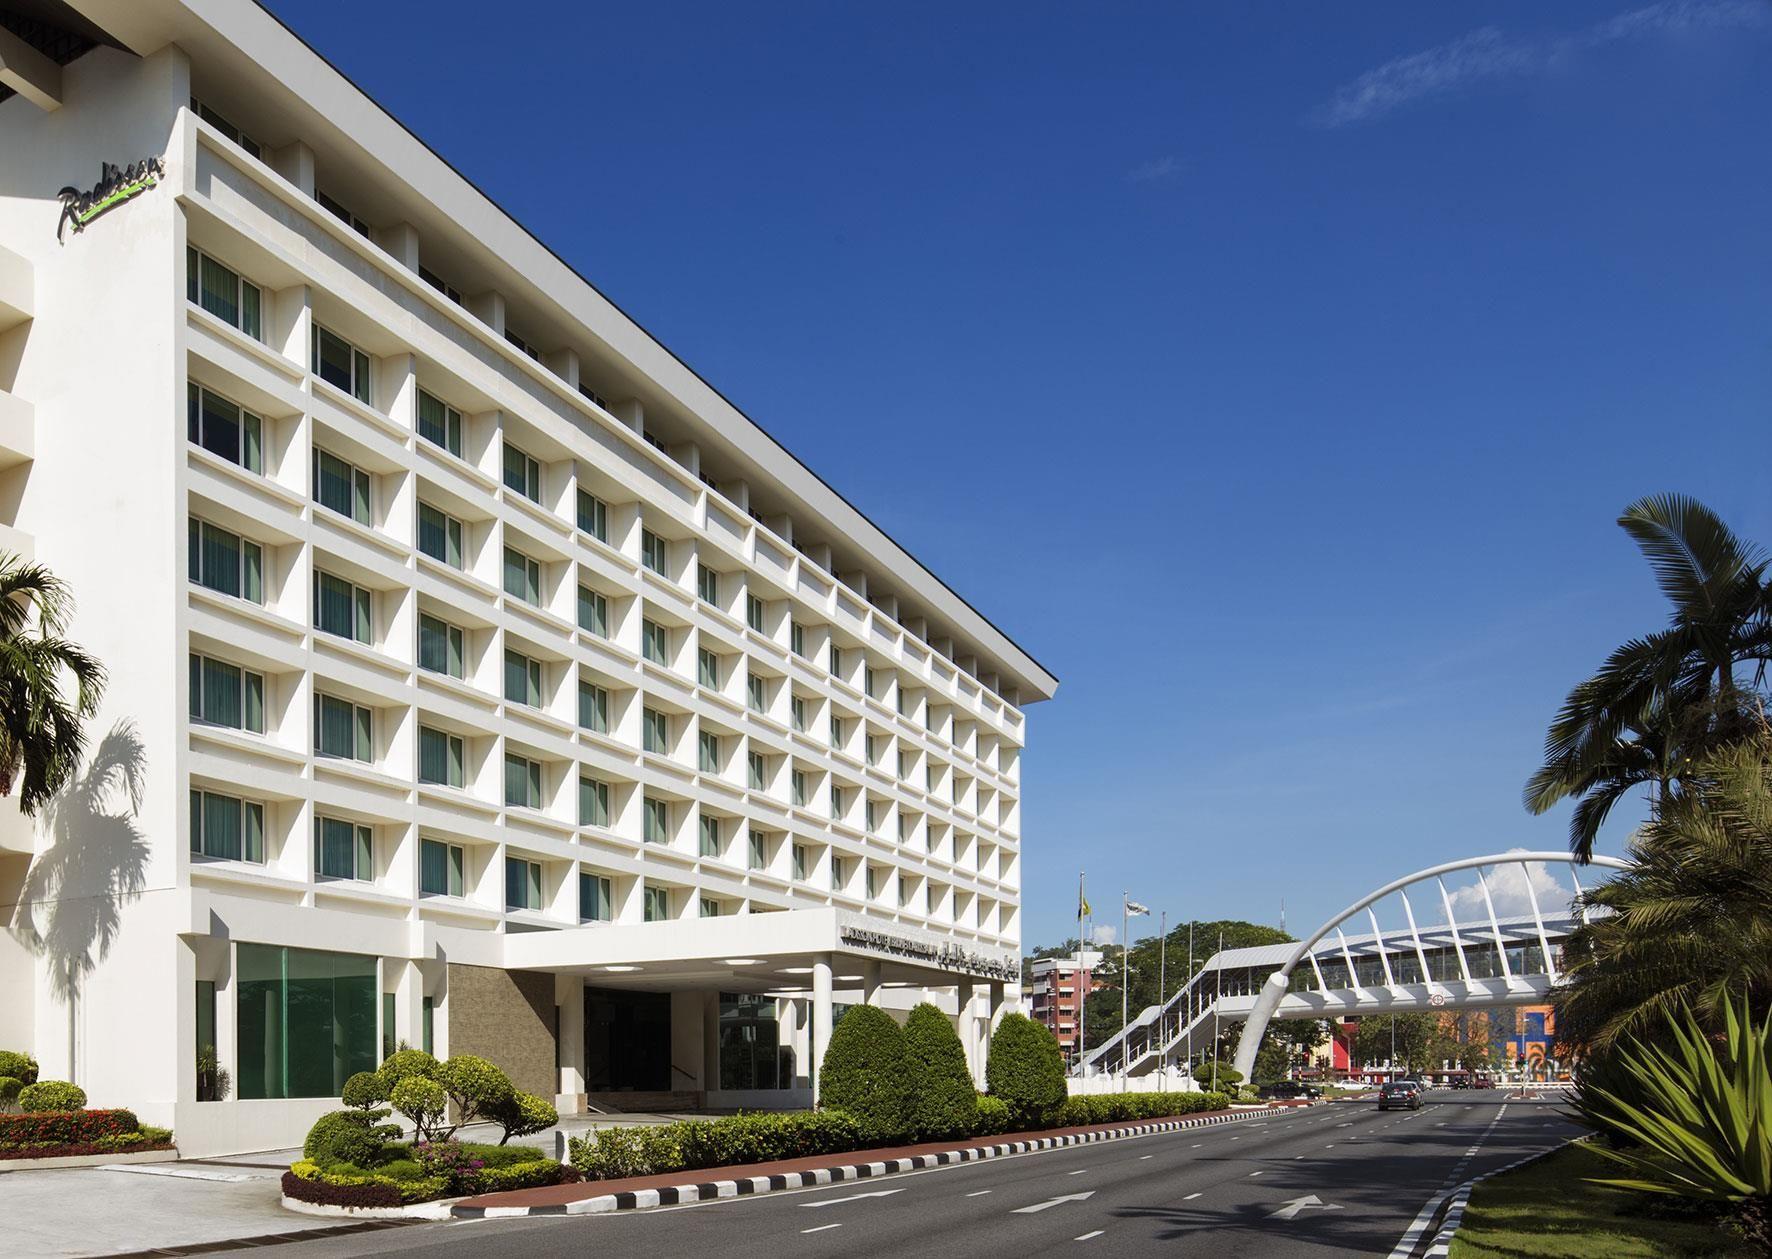 Bandar Seri Begawan Radisson Hotel Brunei Brunei Darussalam Asia Located In Kianggeh Radisson Hotel Brunei Is A Perf Radisson Hotel Hotel Bandar Seri Begawan